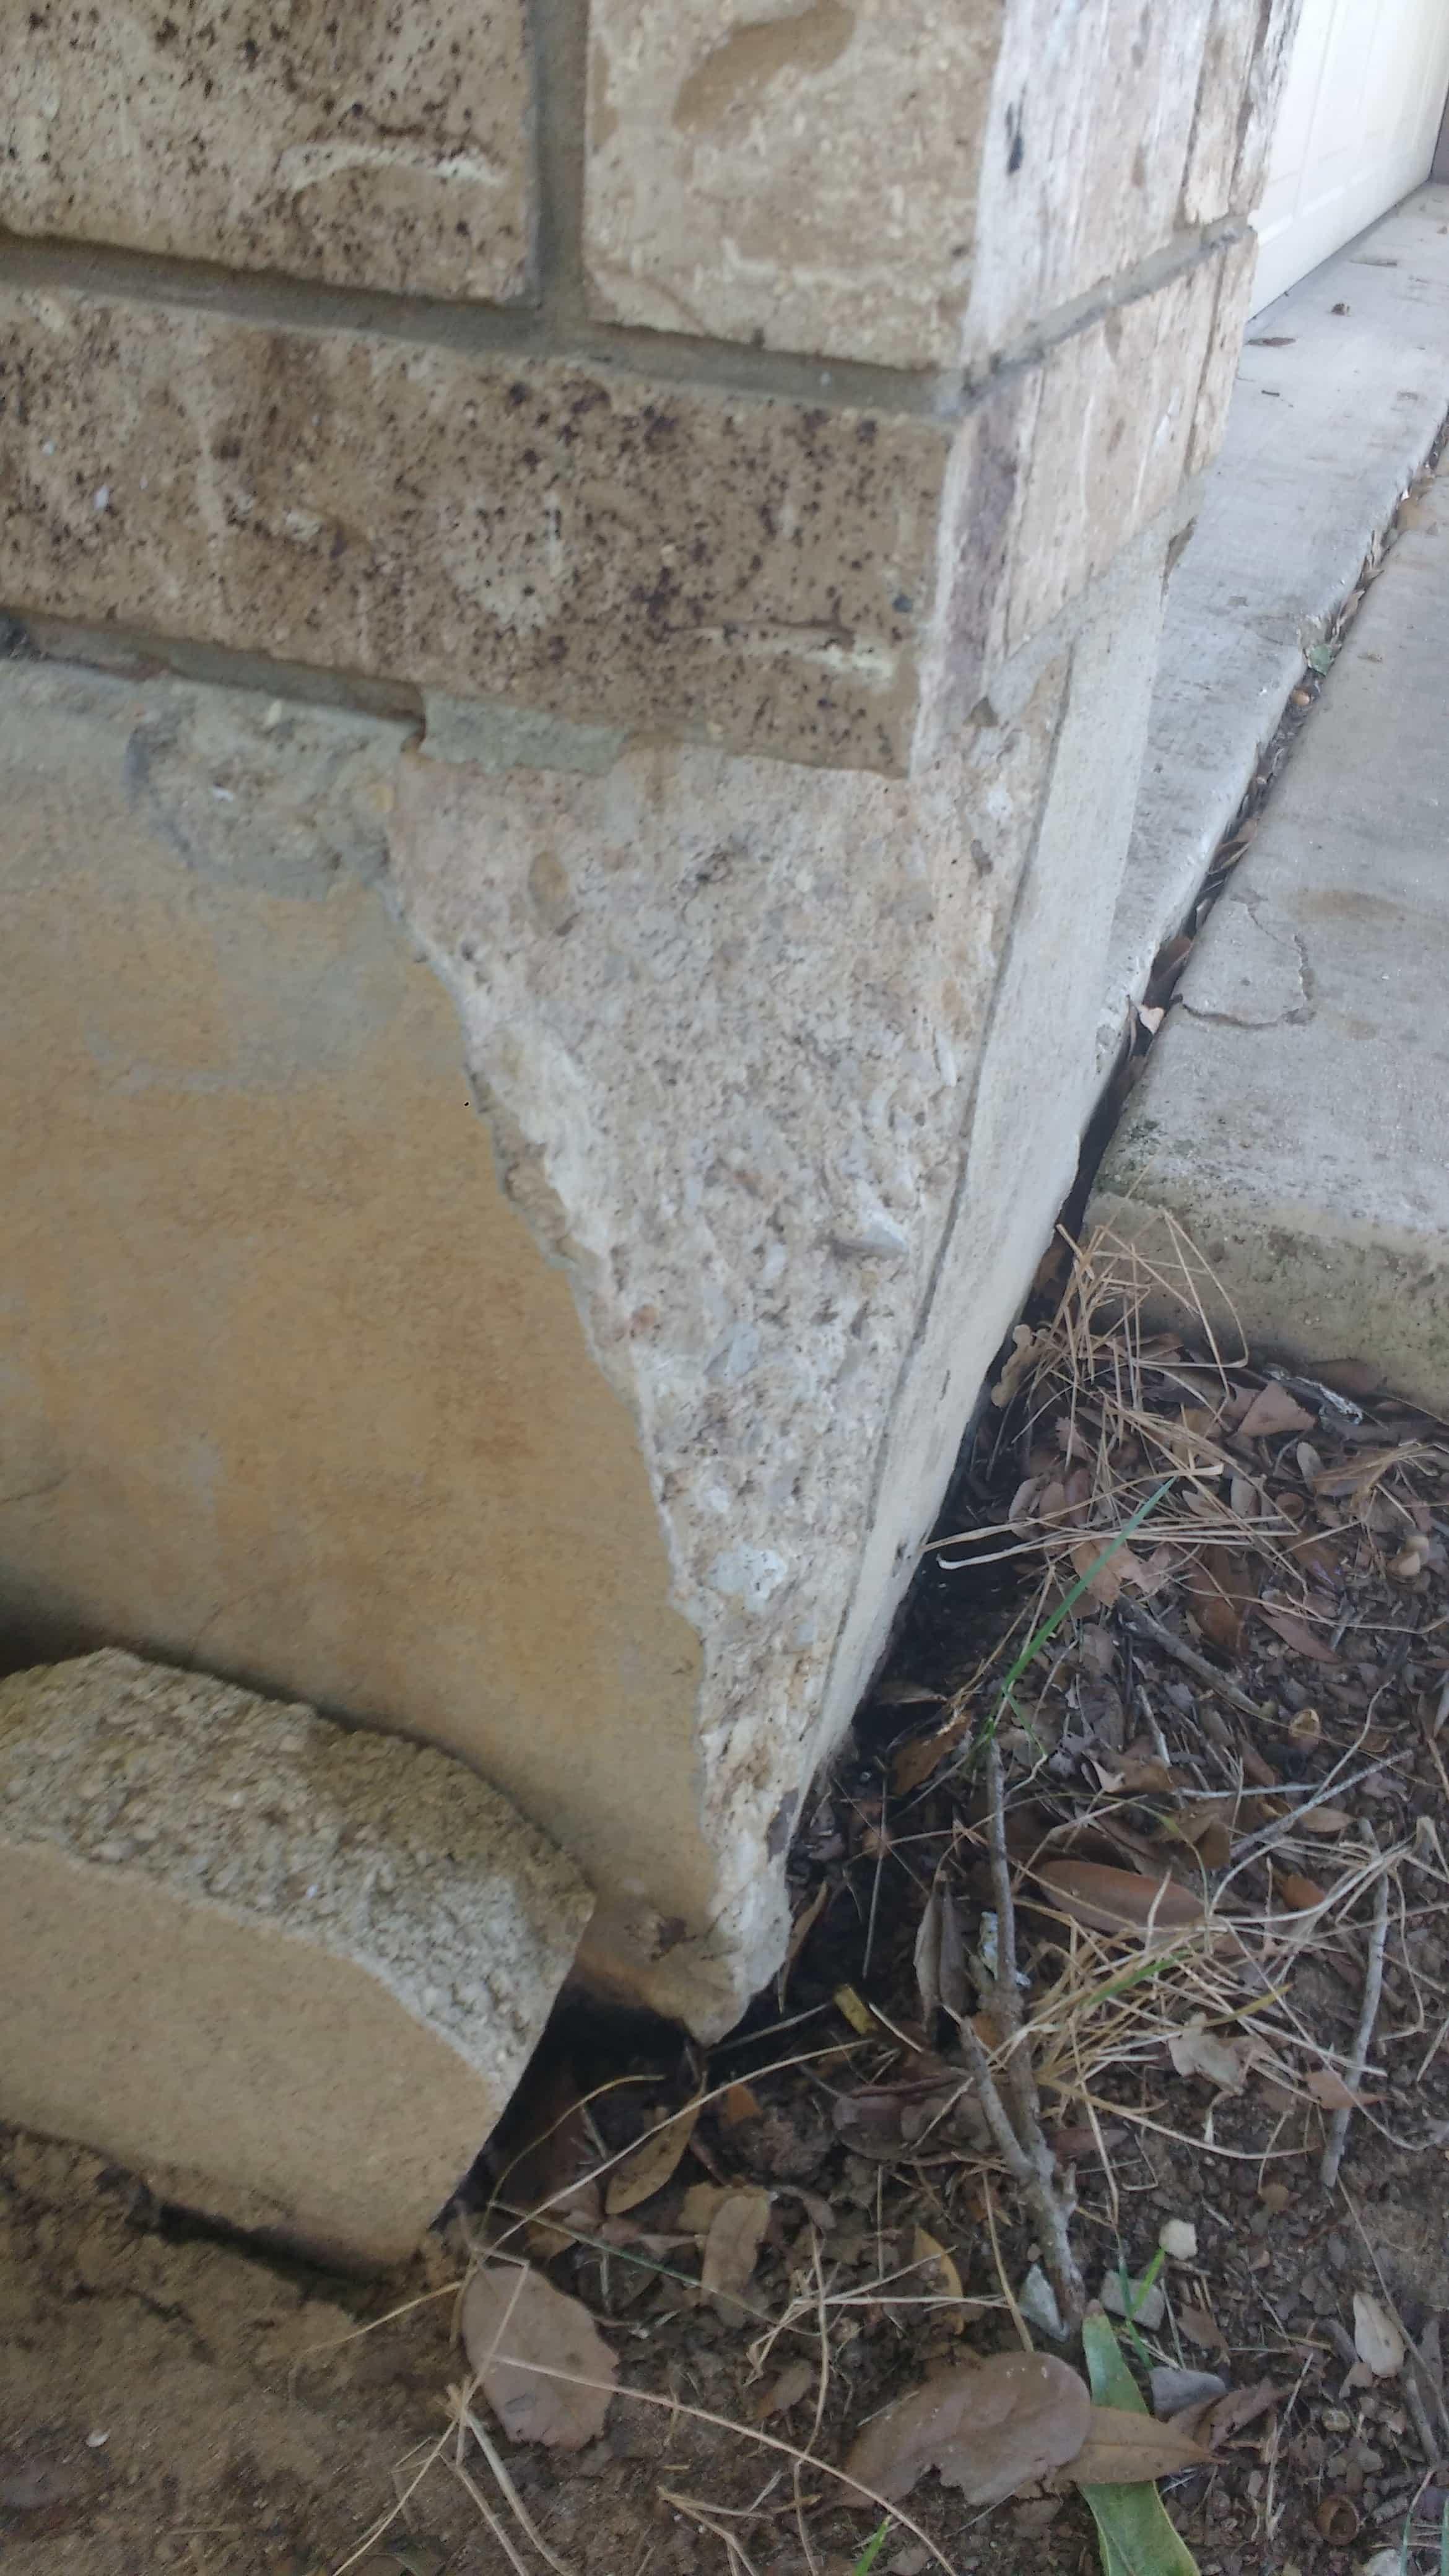 foundation with wedge cracks